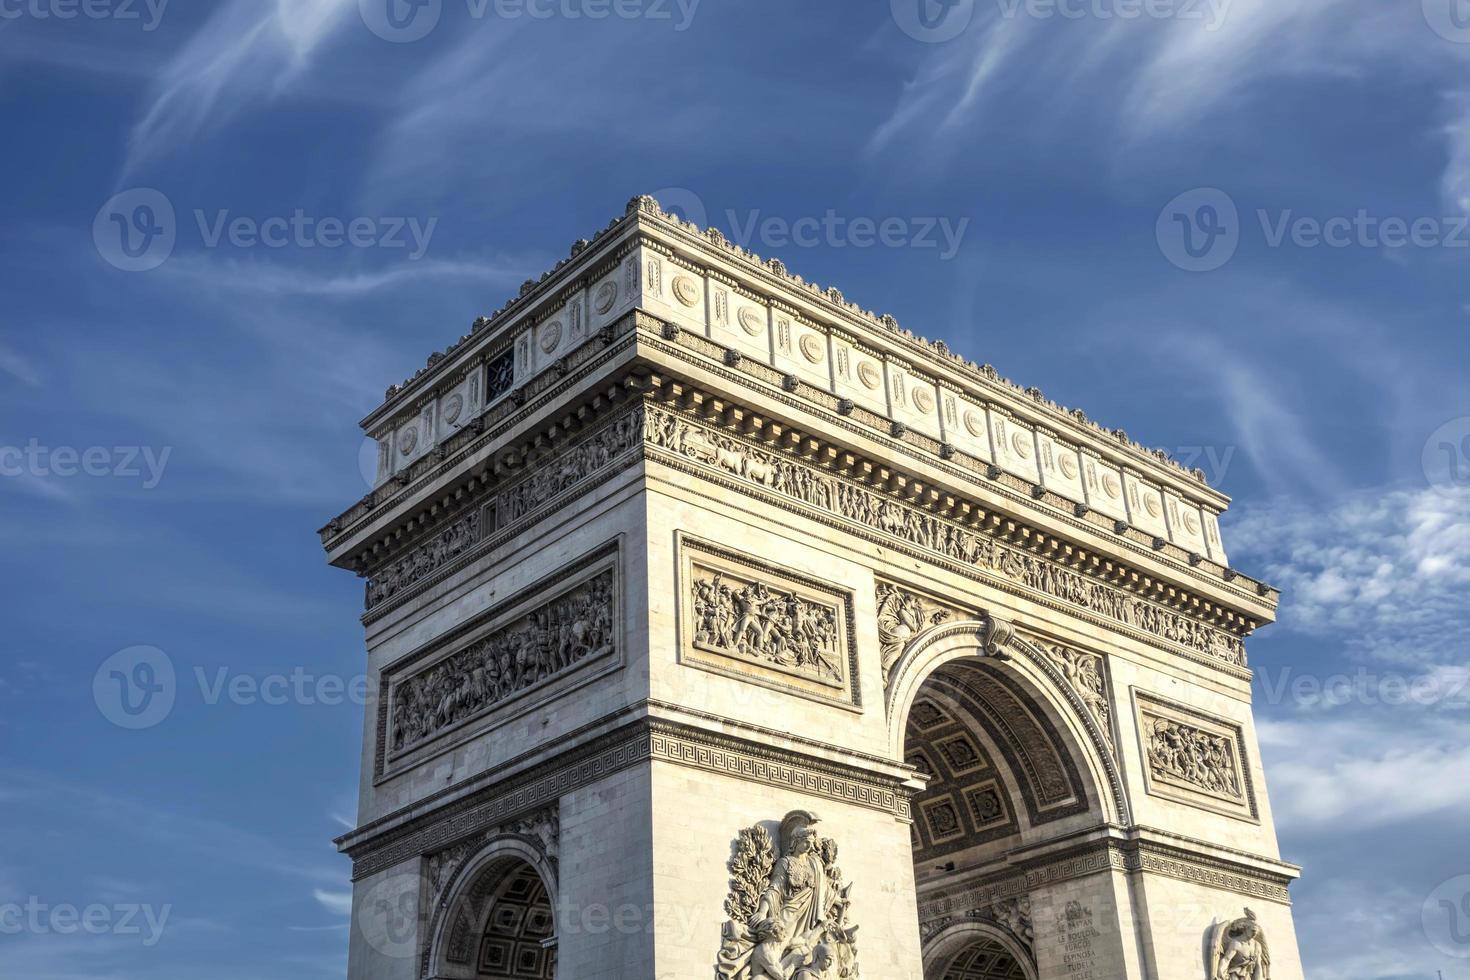 Arco di Trionfo foto